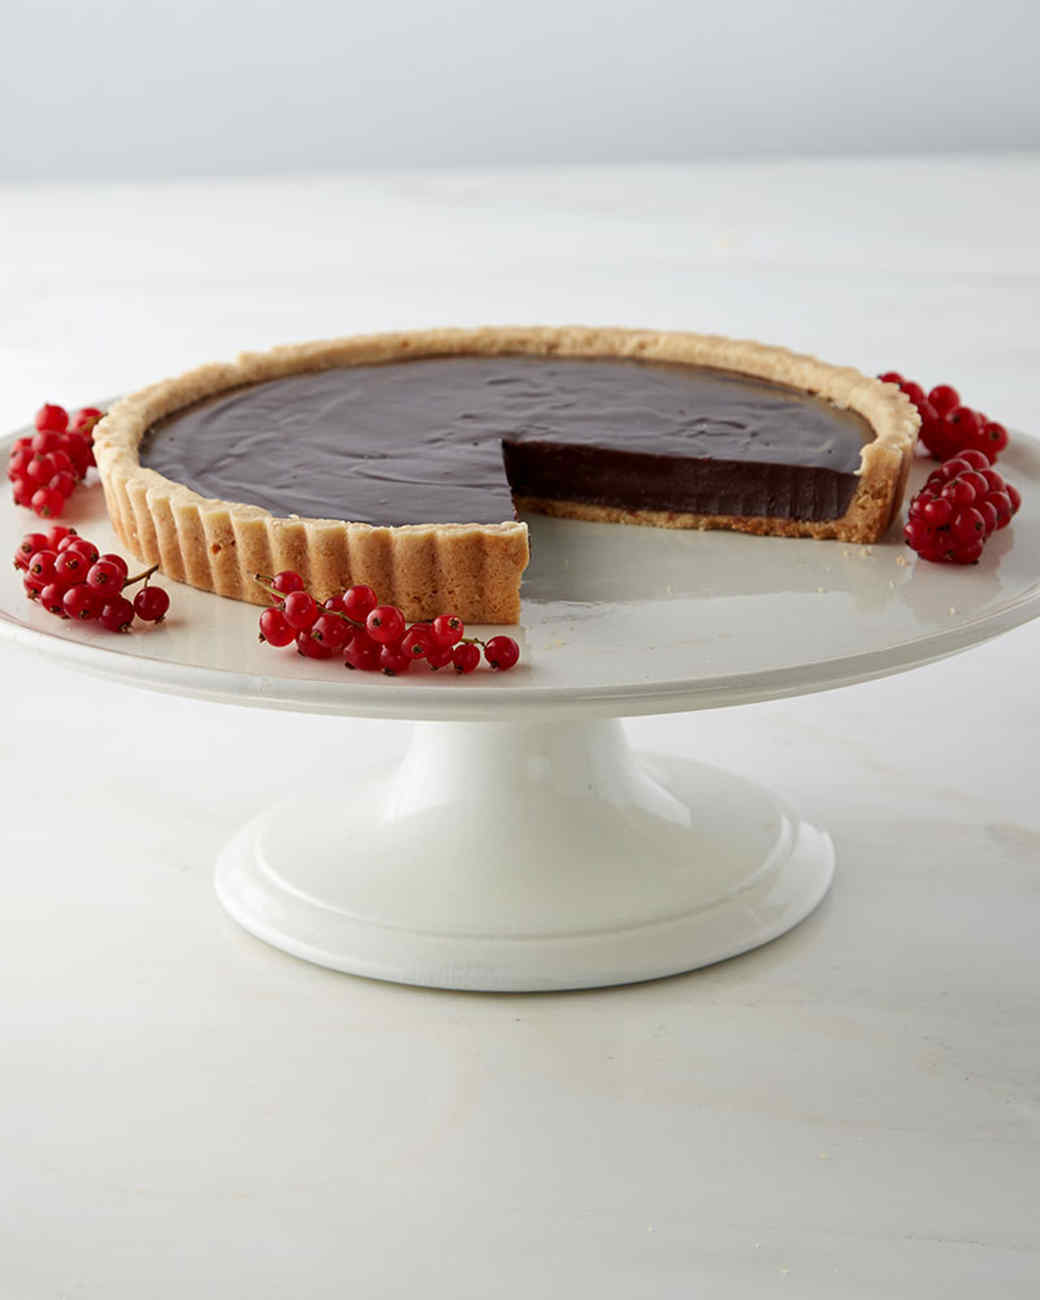 chocolate-ganache-tart-166-d112925.jpg